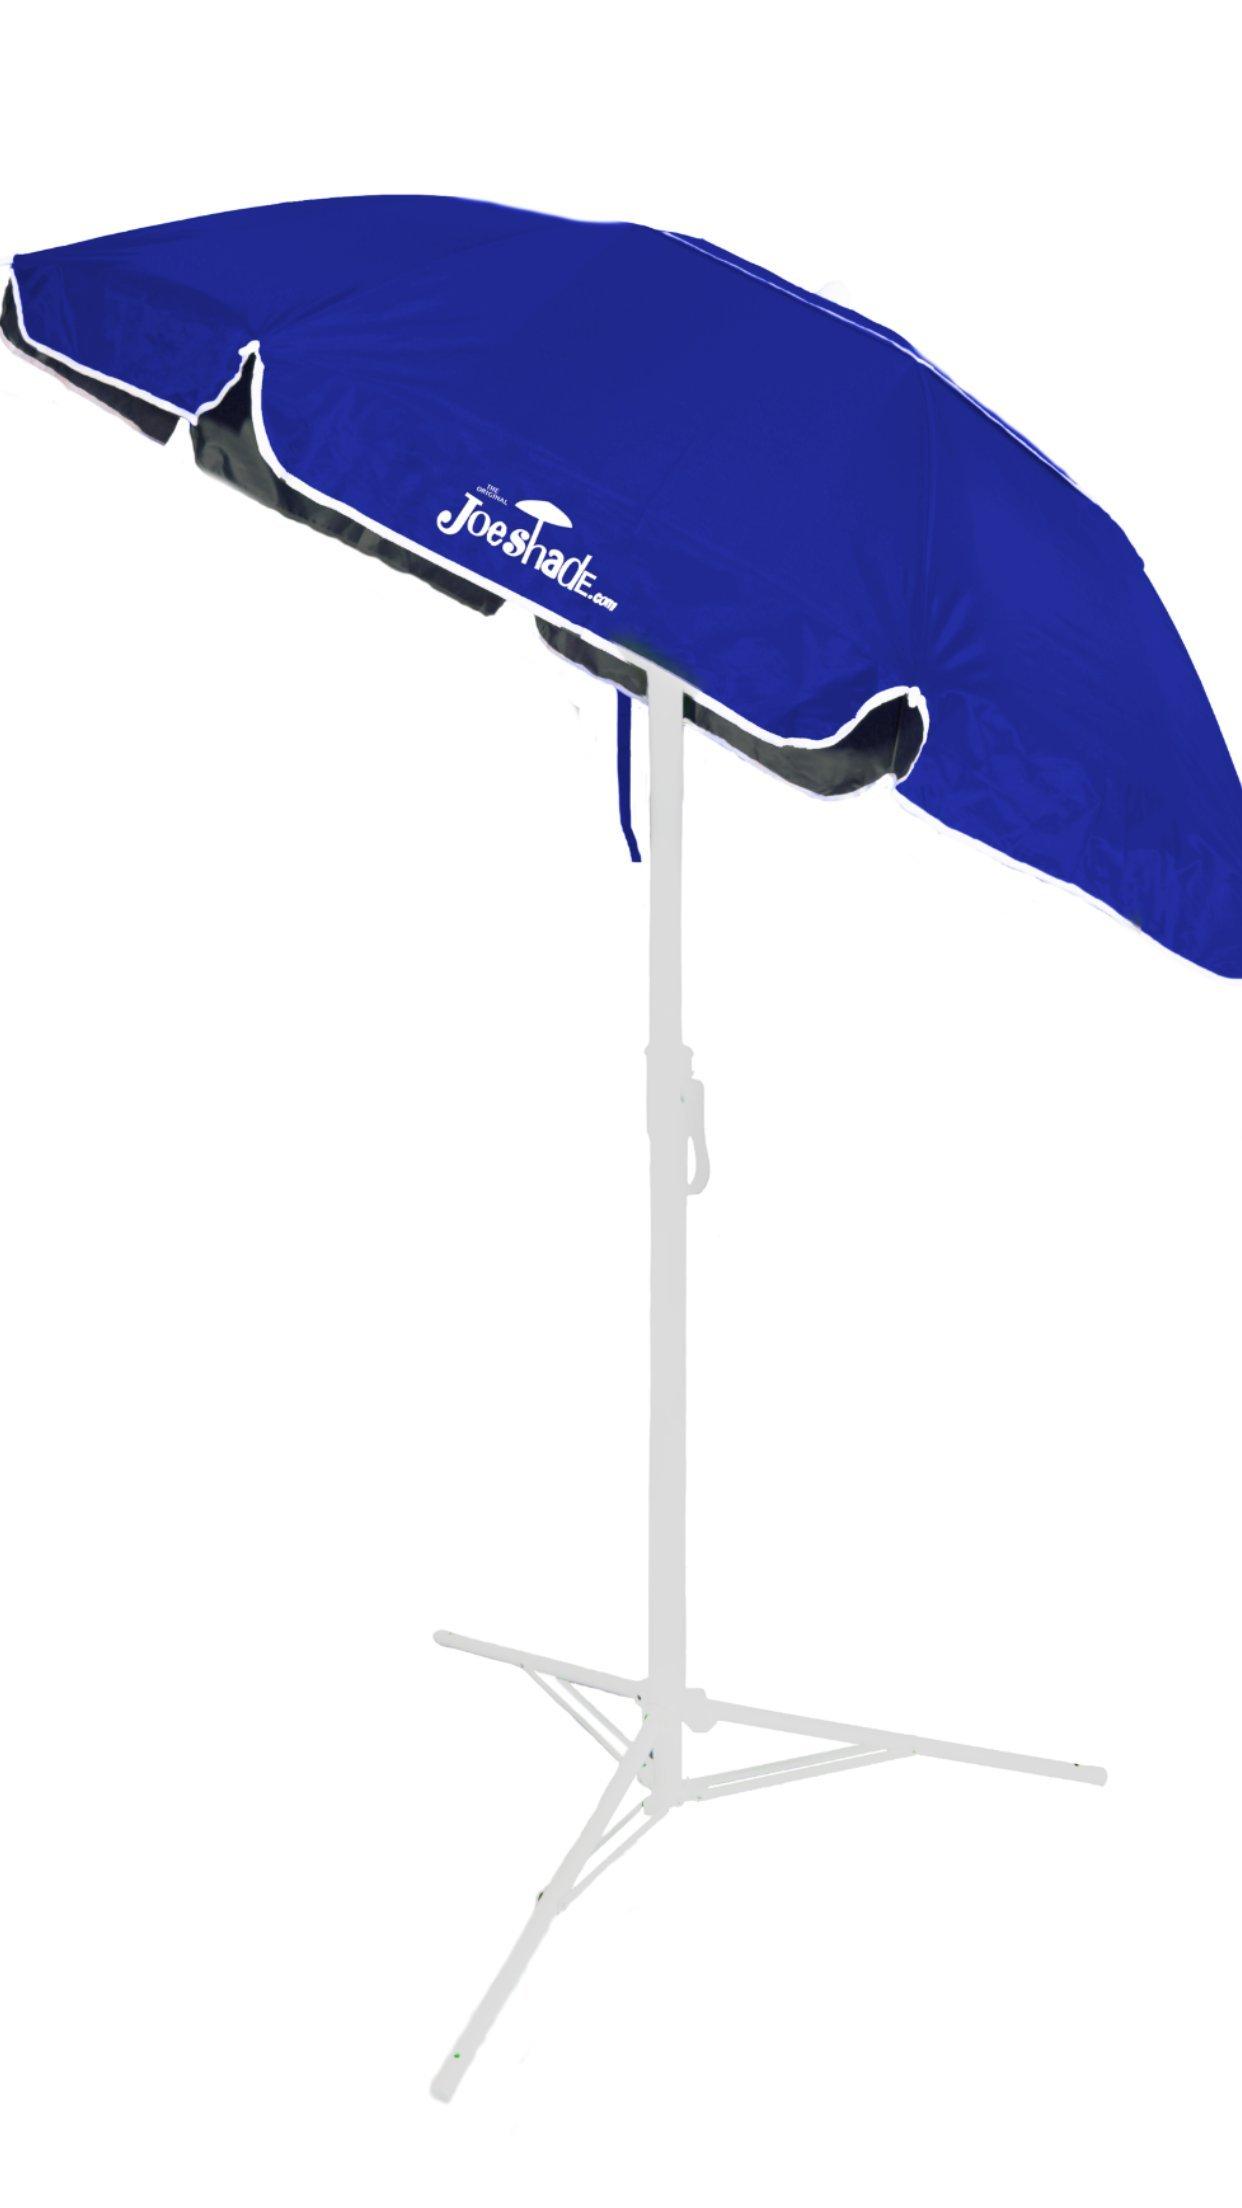 JoeShade, Portable Sun Shade Umbrella, Sunshade Umbrella, Sports Umbrella, BLUE